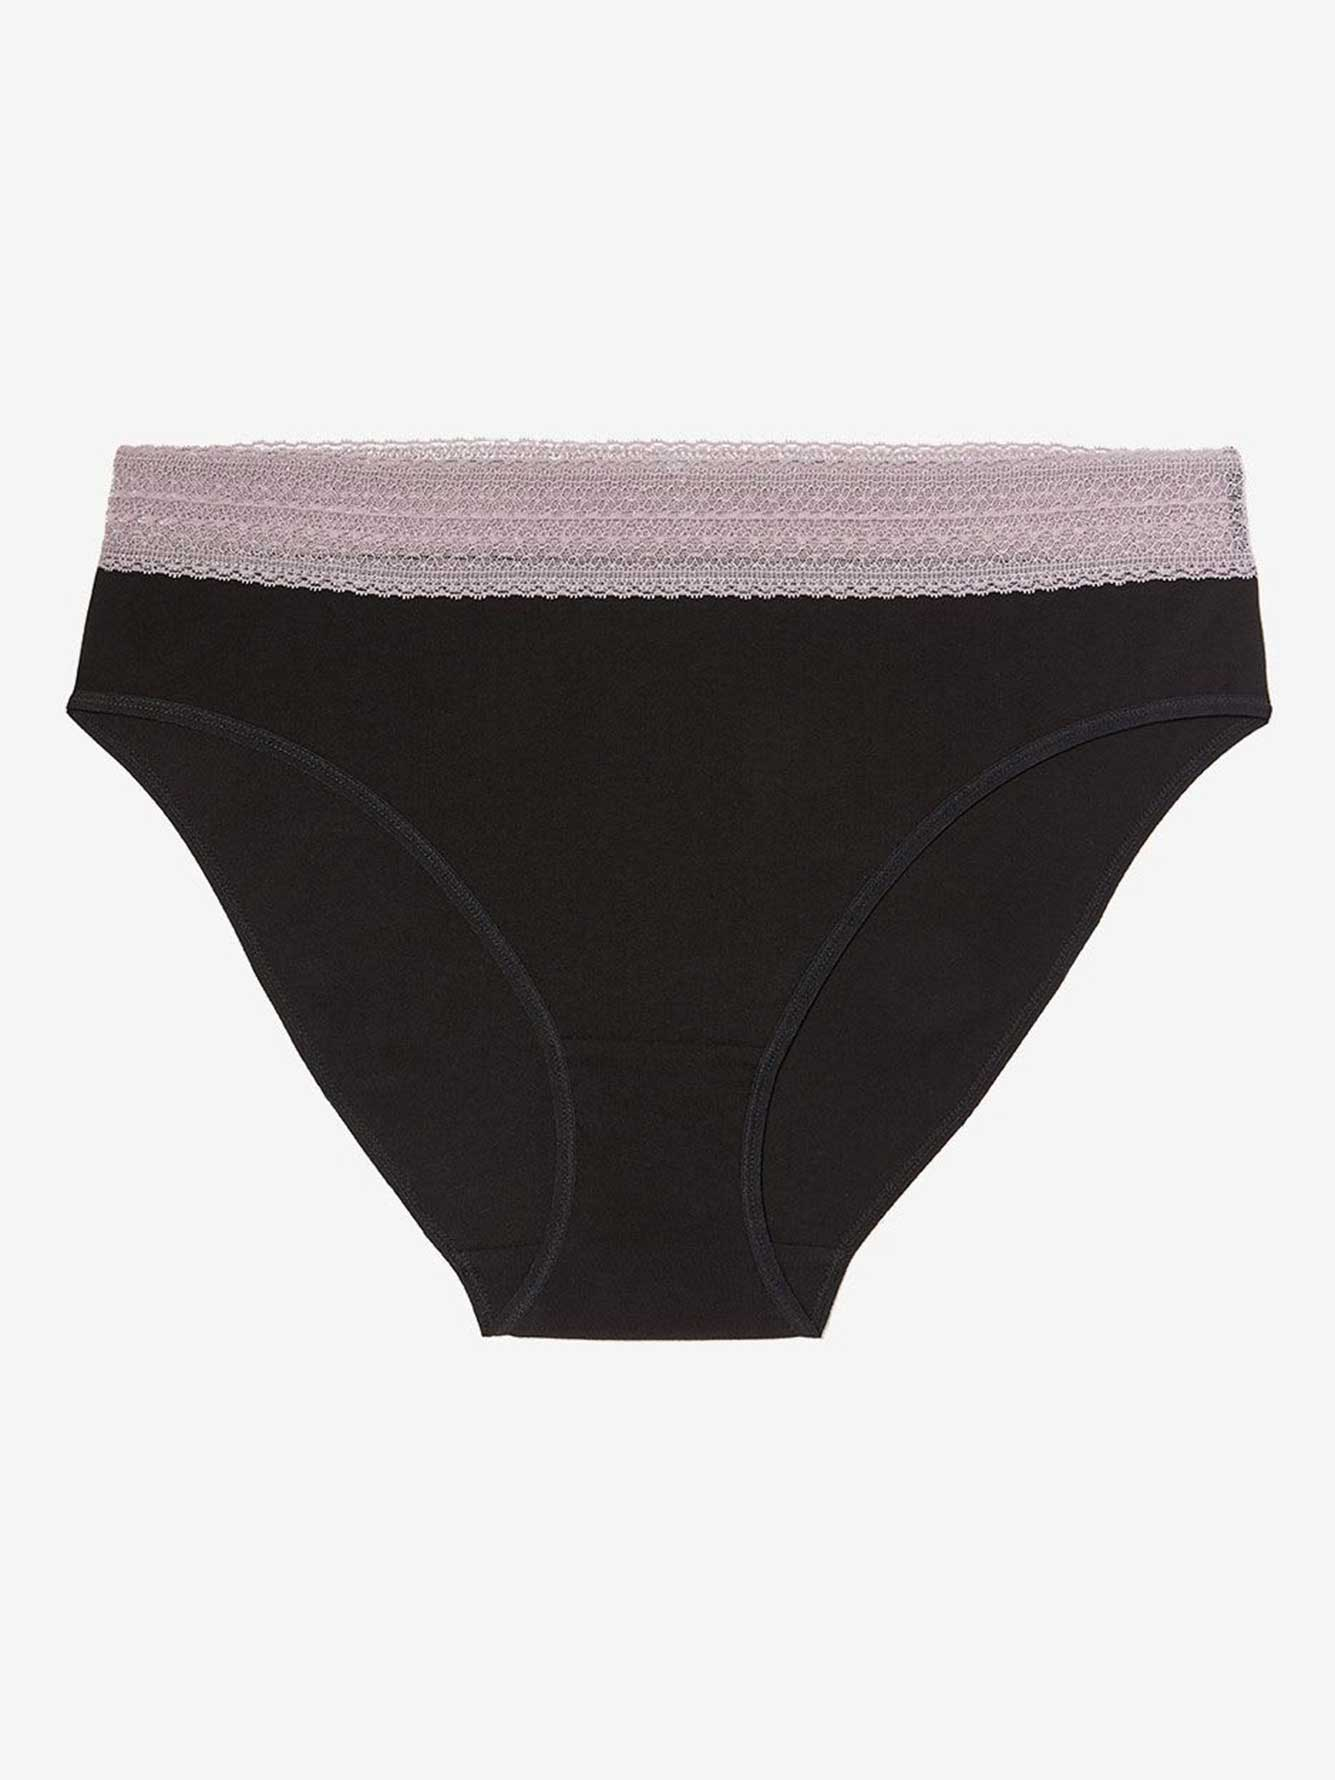 f4cdf6312d High Cut Cotton Panty with Lace - Déesse Collection